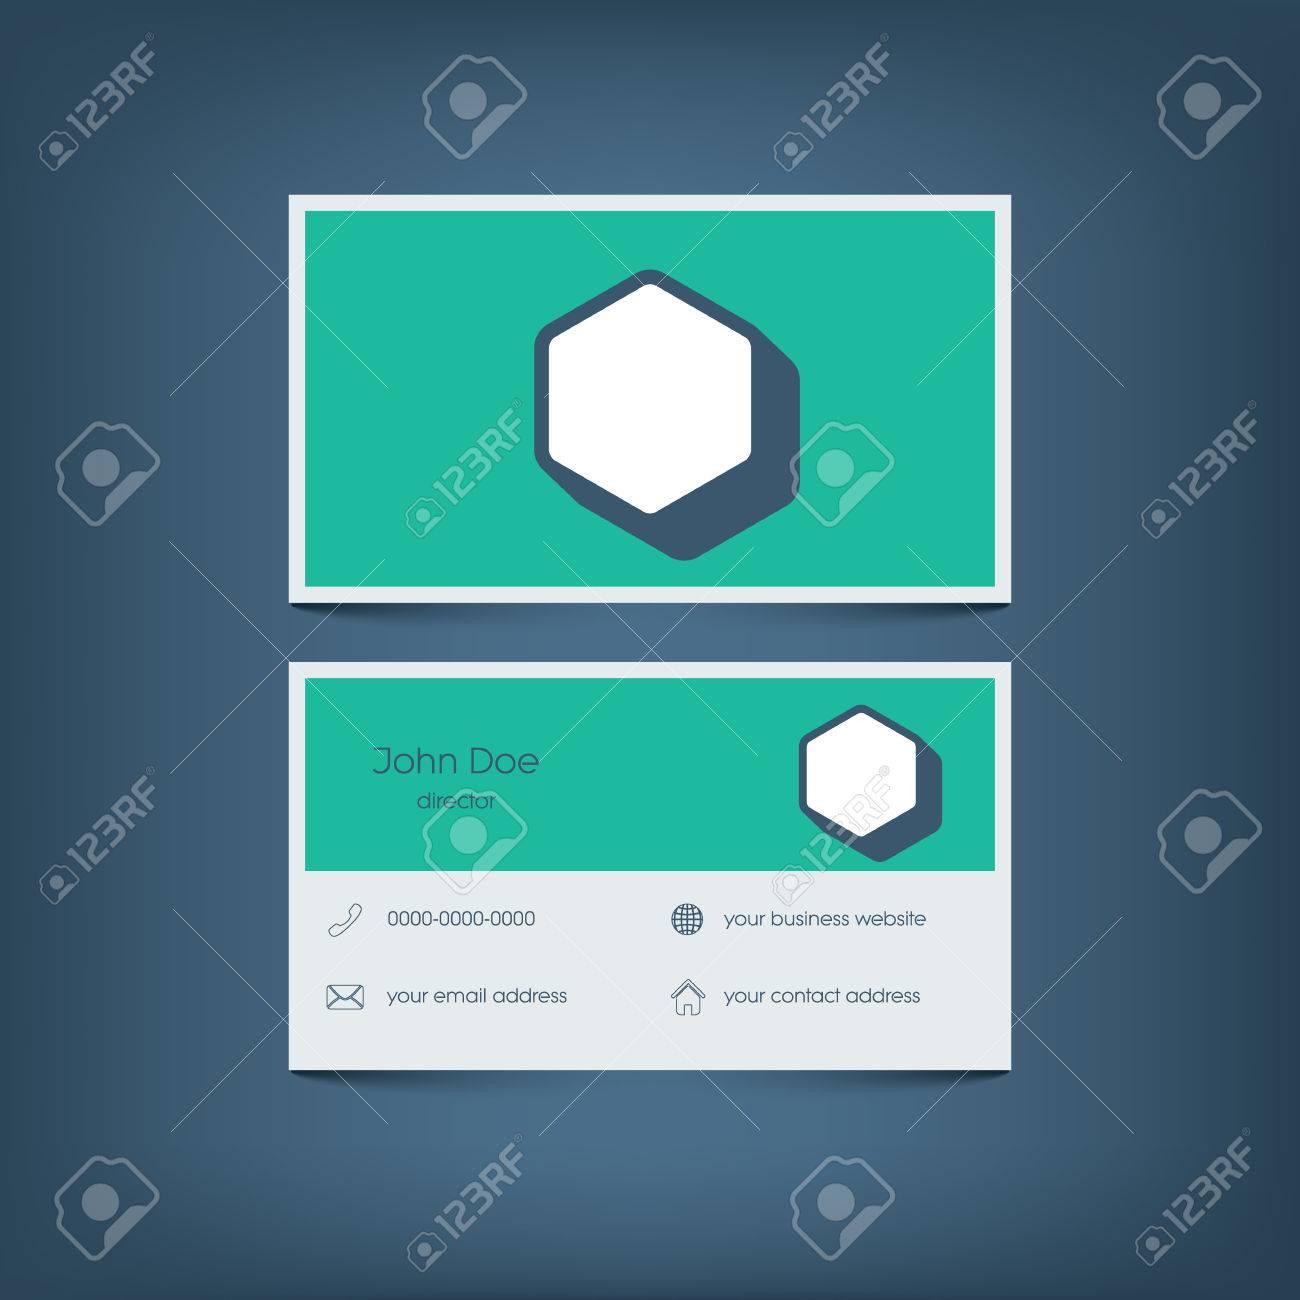 Modern flat design business card template graphic user interface modern flat design business card template graphic user interface with line icons for website magicingreecefo Gallery